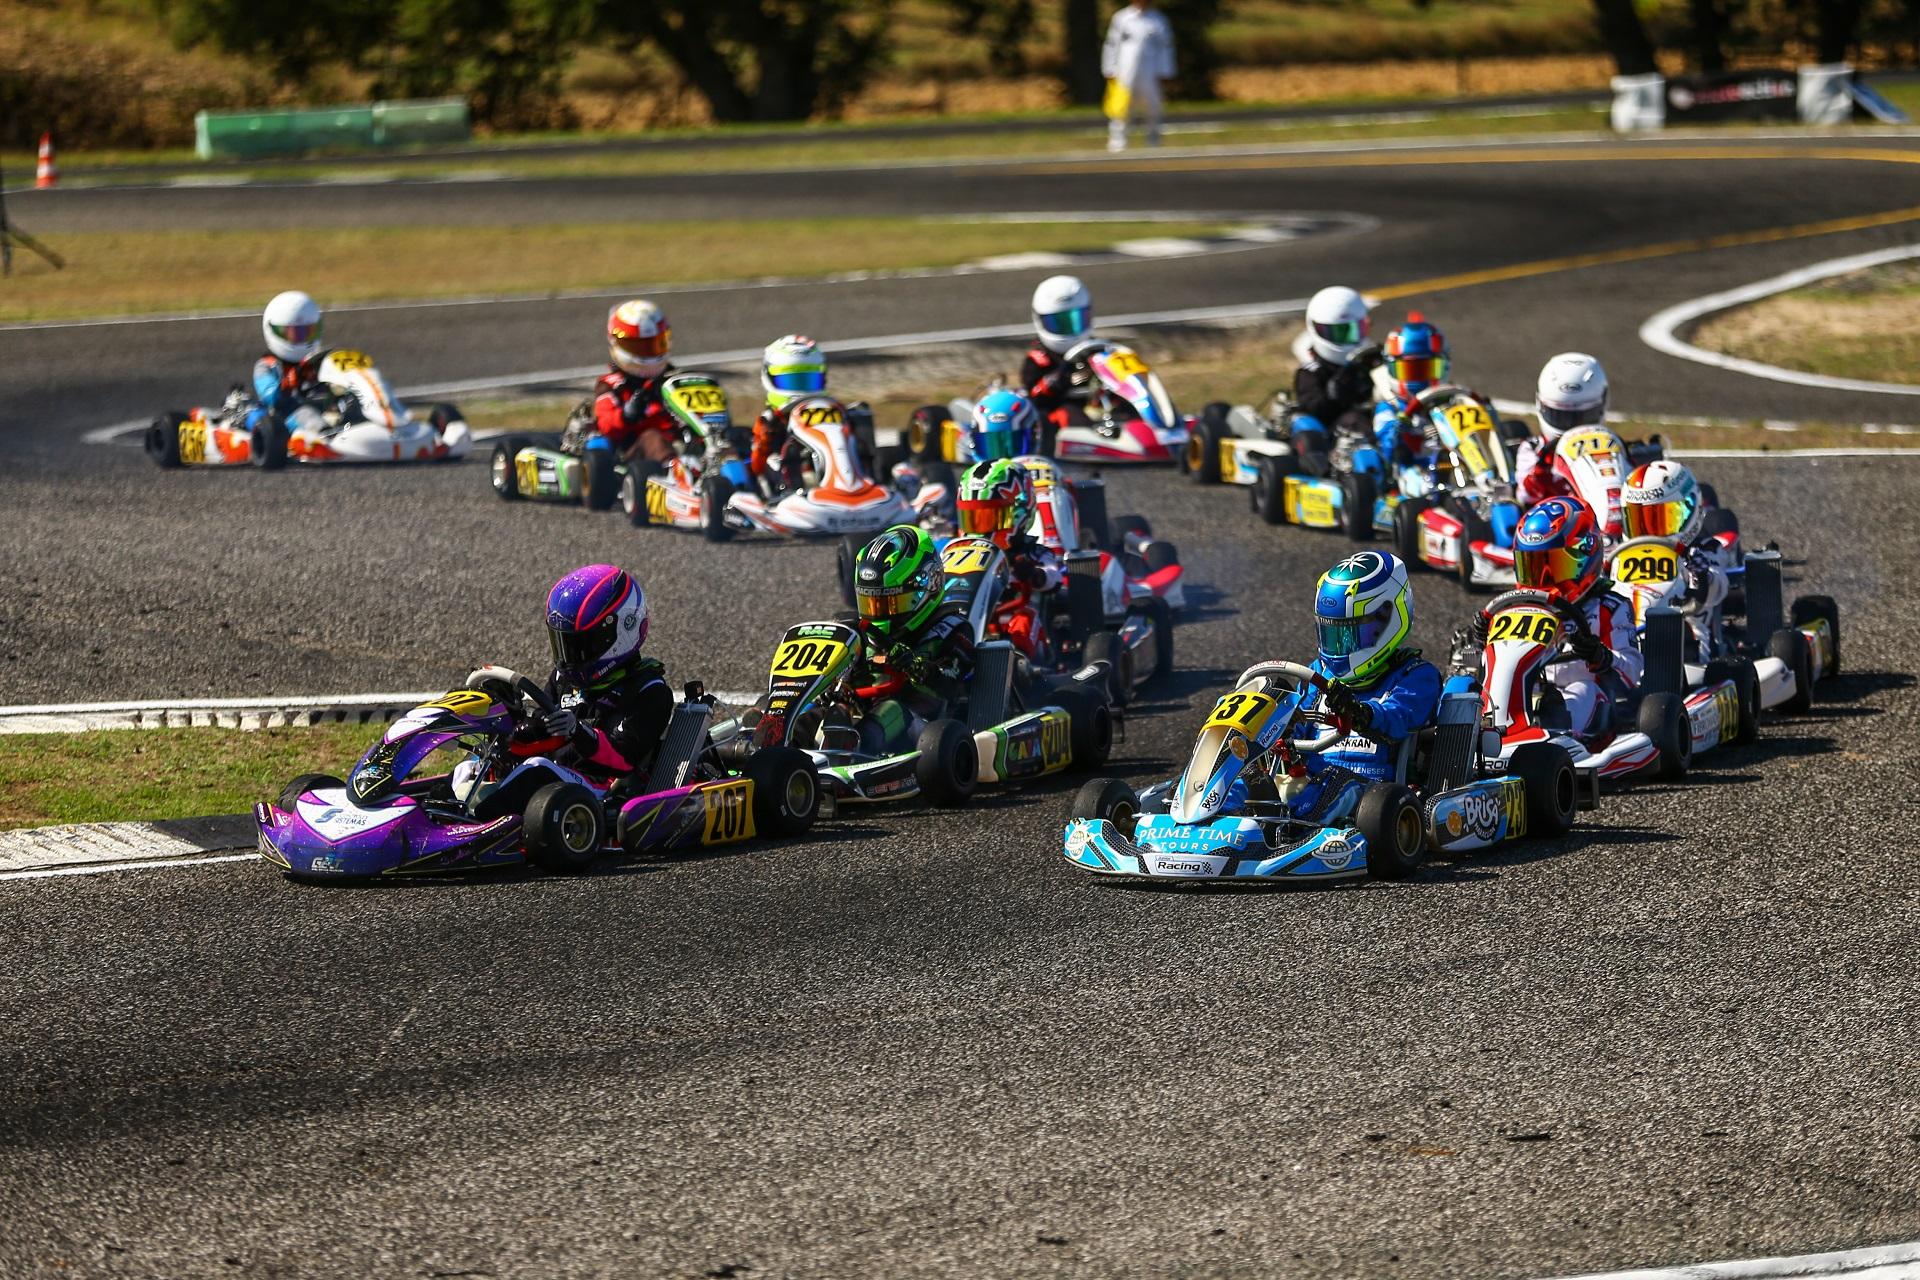 Martim Meneses volta a vencer no CPK da categoria X30 Mini no Bombarral